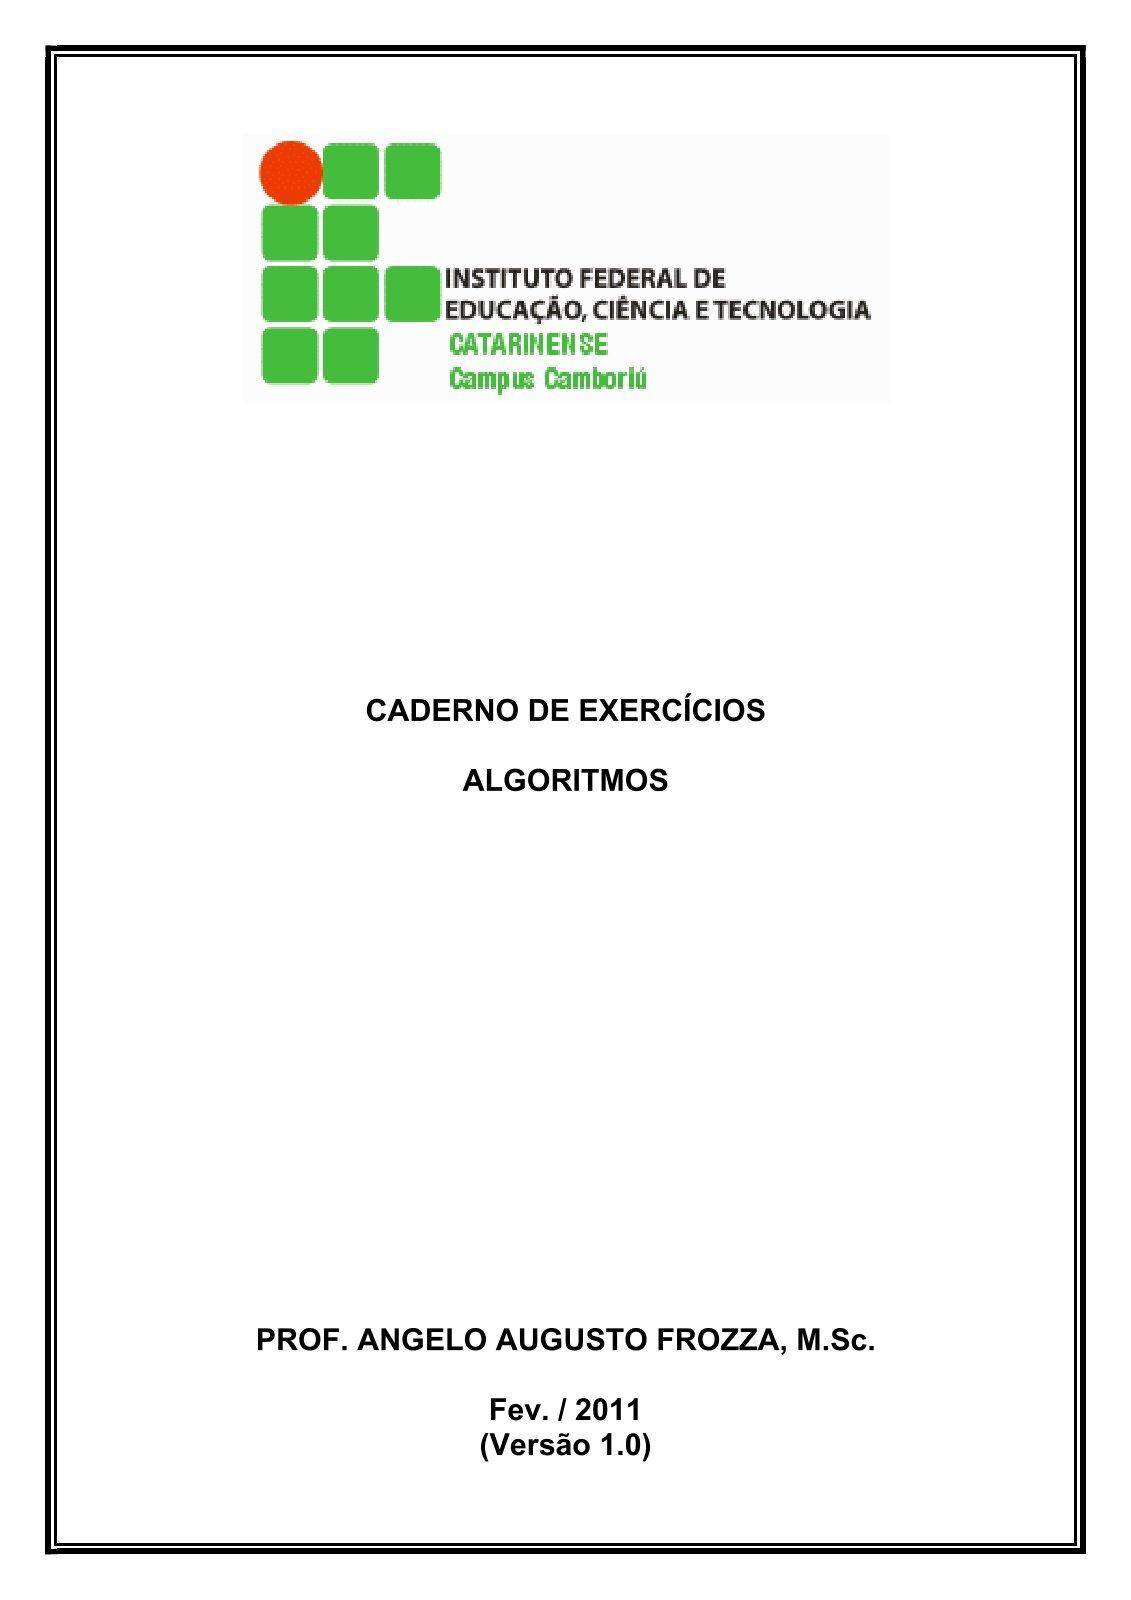 Caderno de Exercicios - Algoritmos-Versao 1.0.pdf